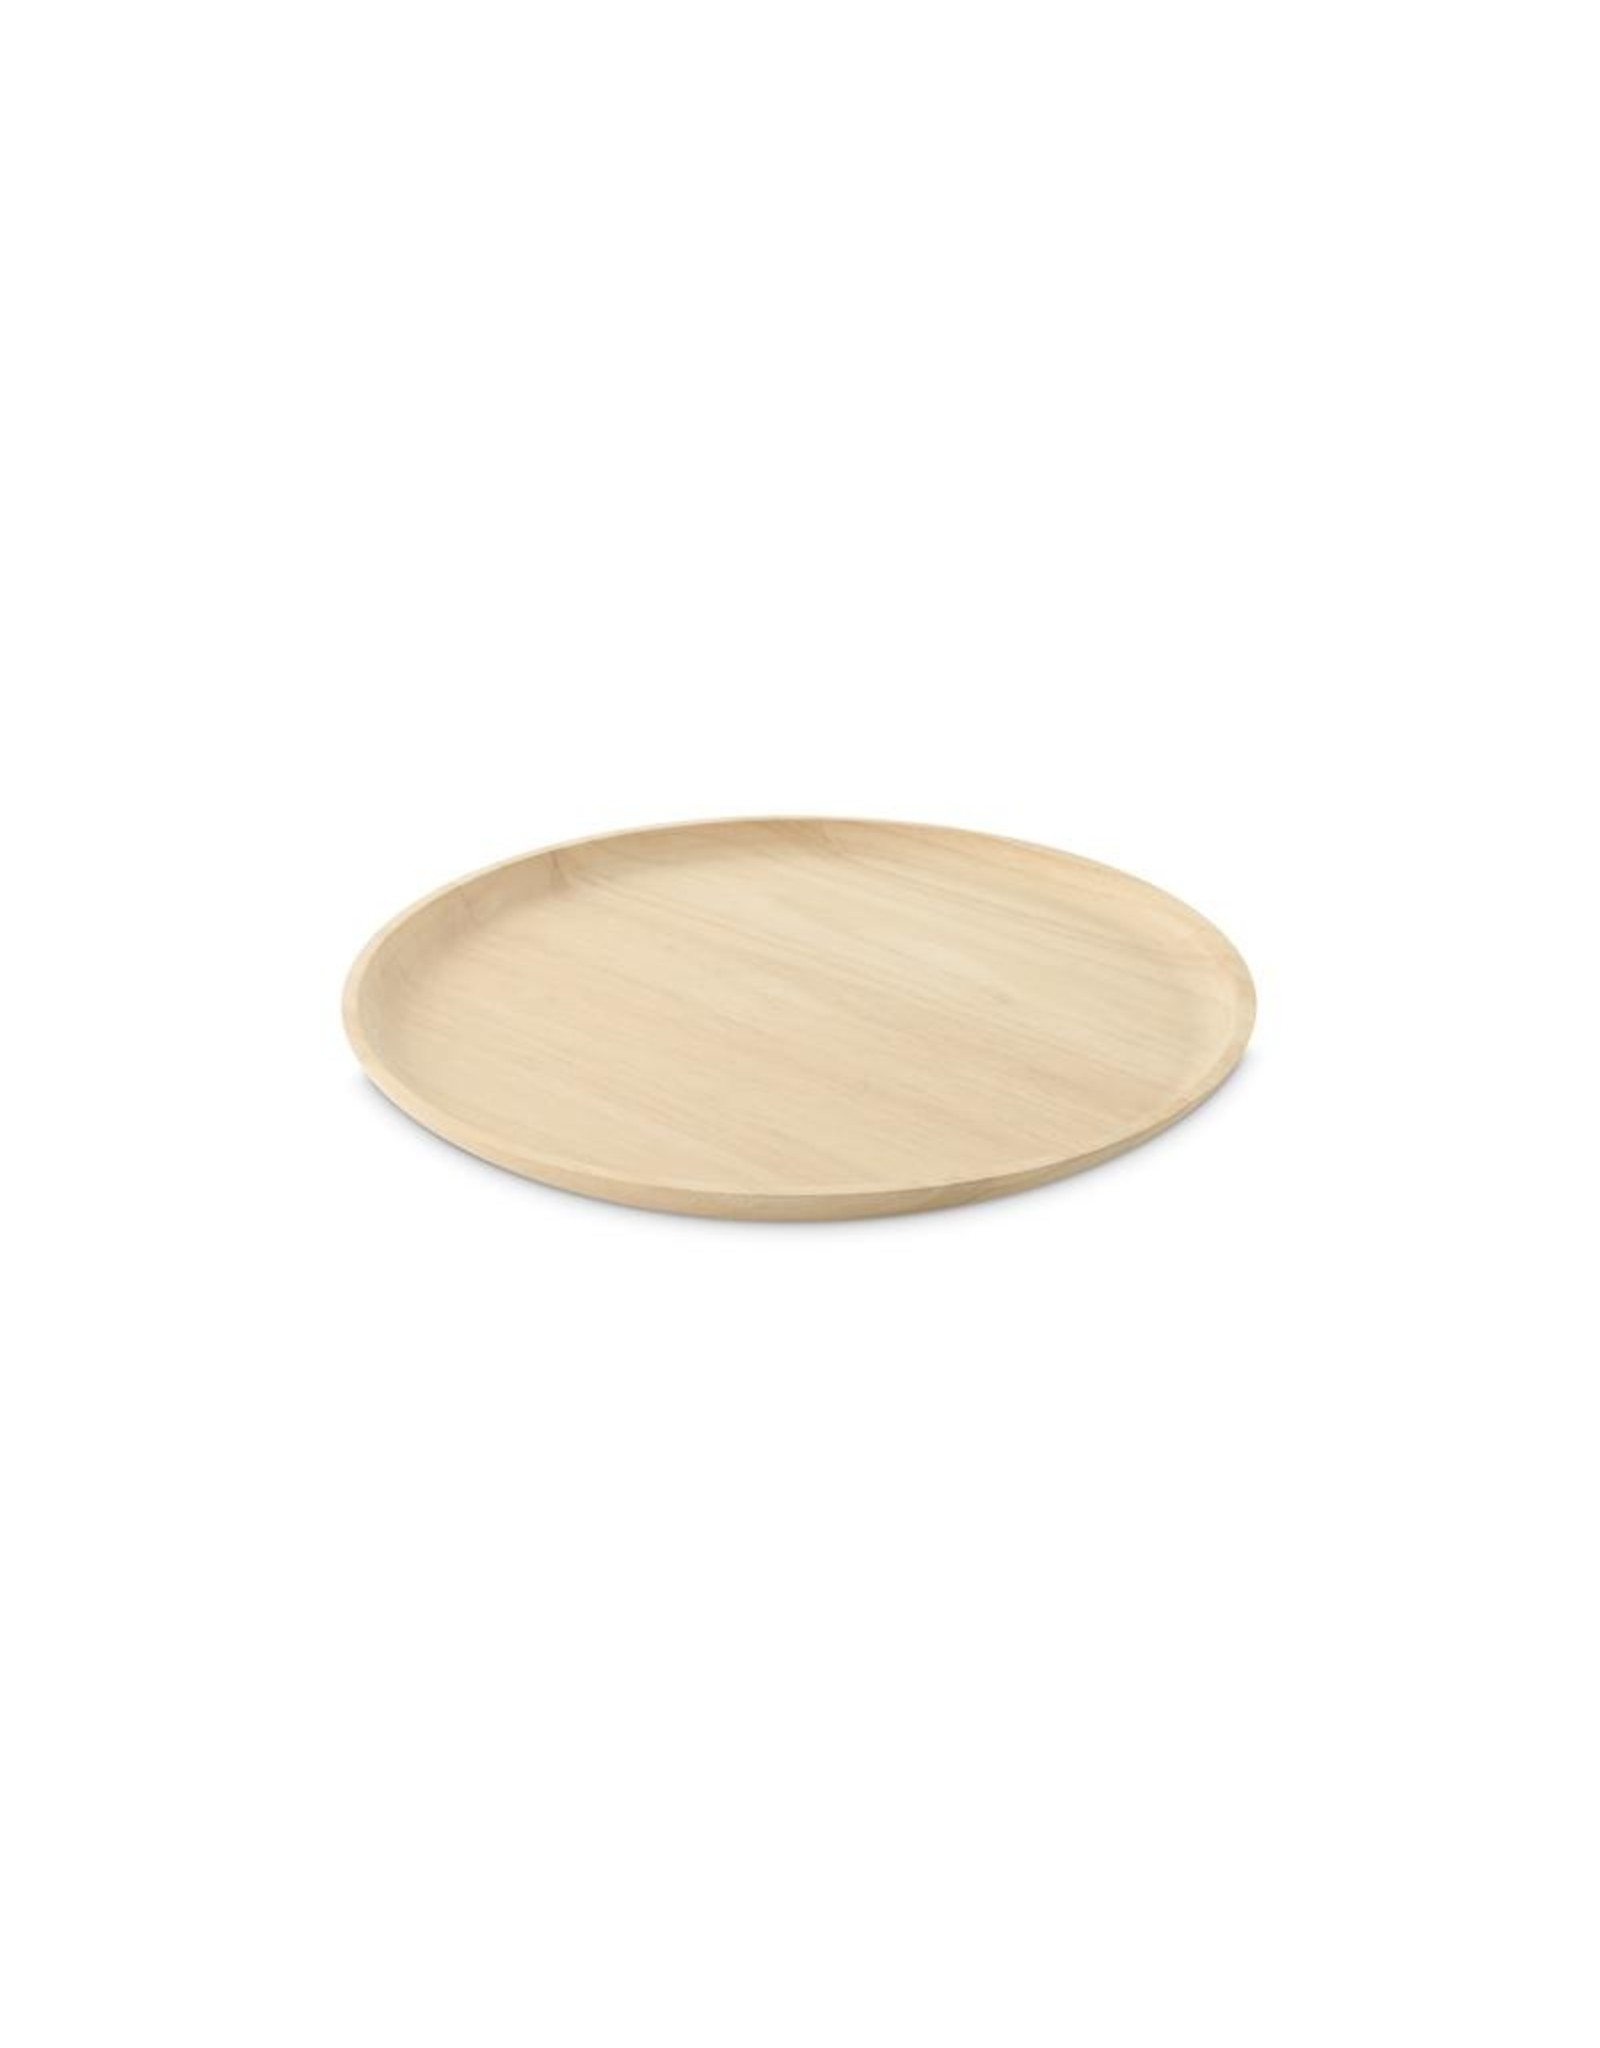 Plateau rubberwood 40cm